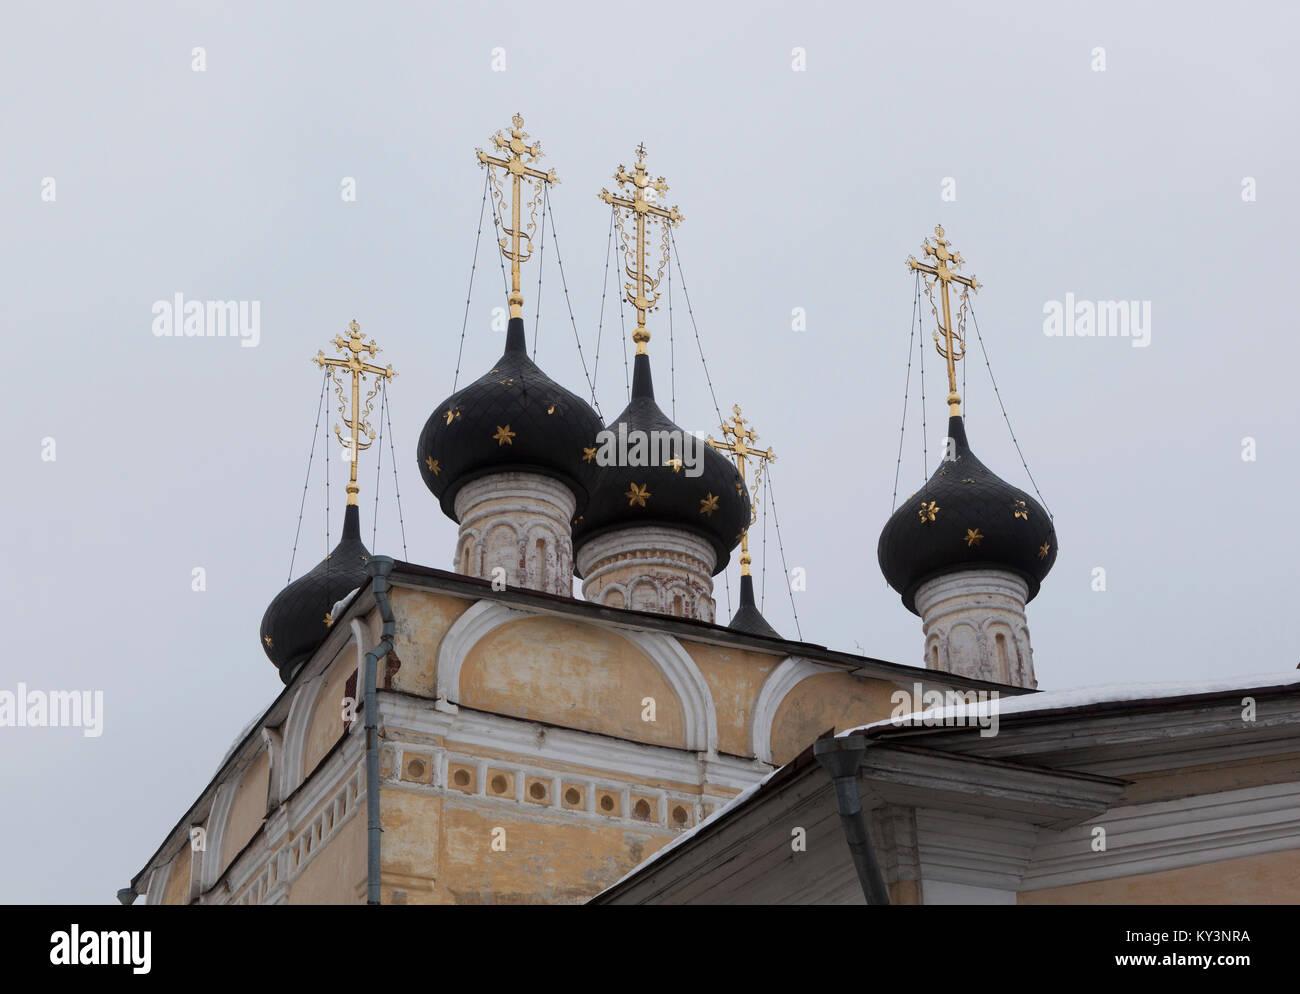 Dome of the Church of St Demetrios on Prilutsk Navolok Vologda, Russia - Stock Image